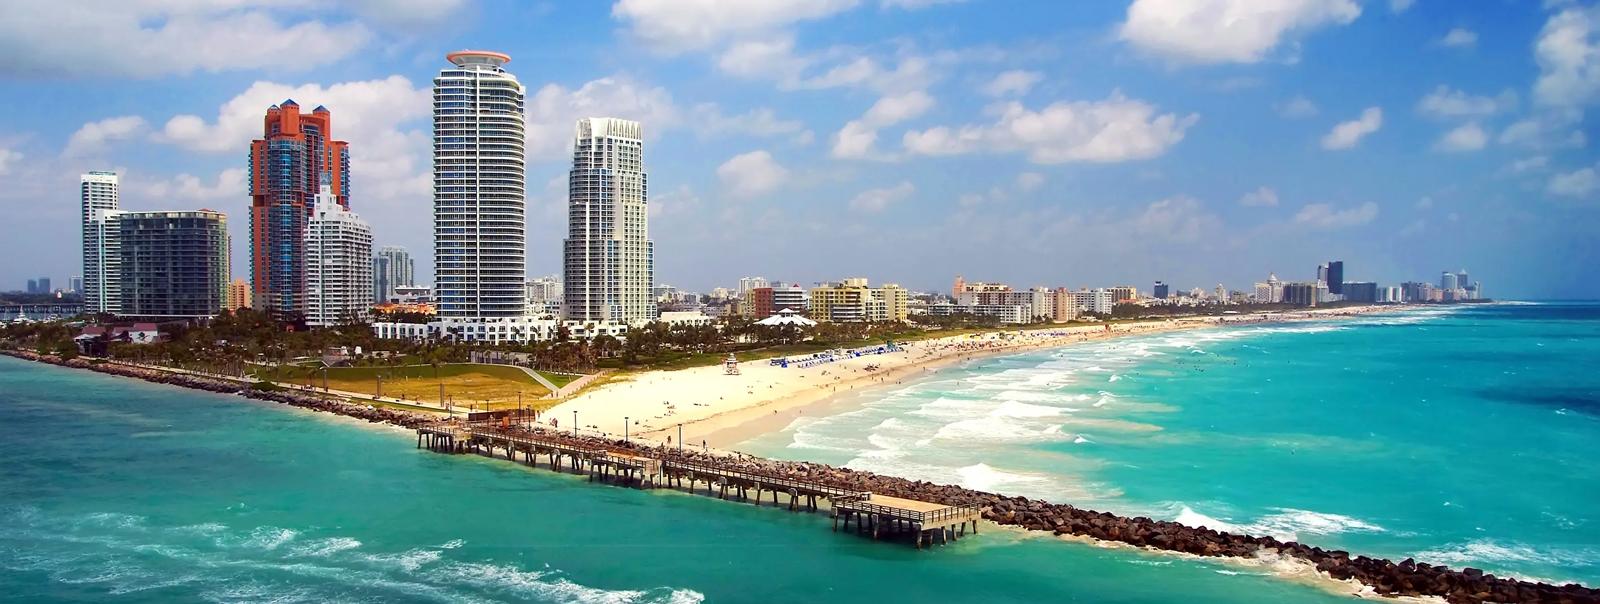 2017 Florida Showcase Dates Announced!